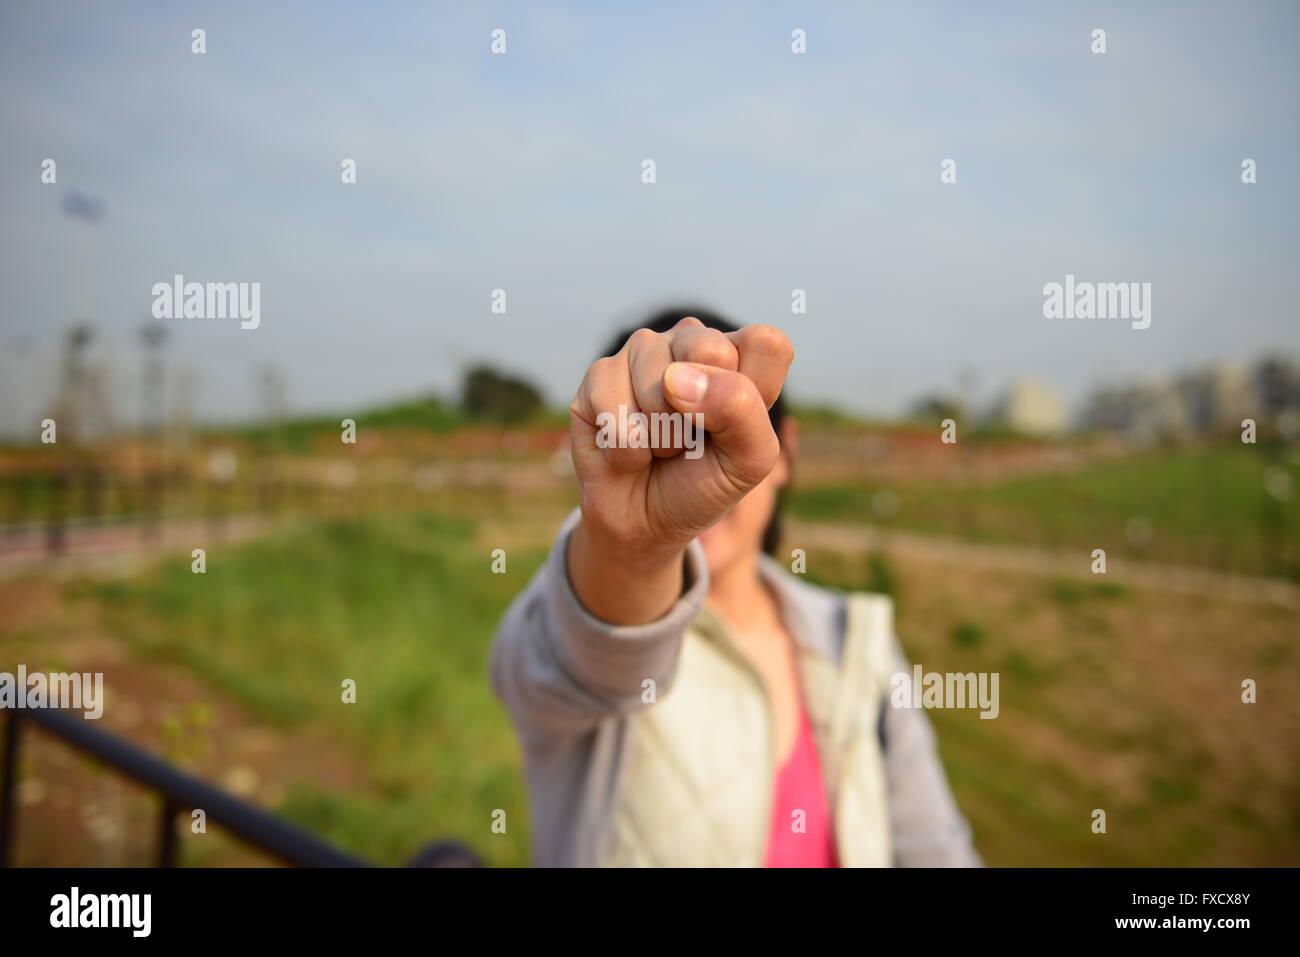 hand making the number zero - Stock Image